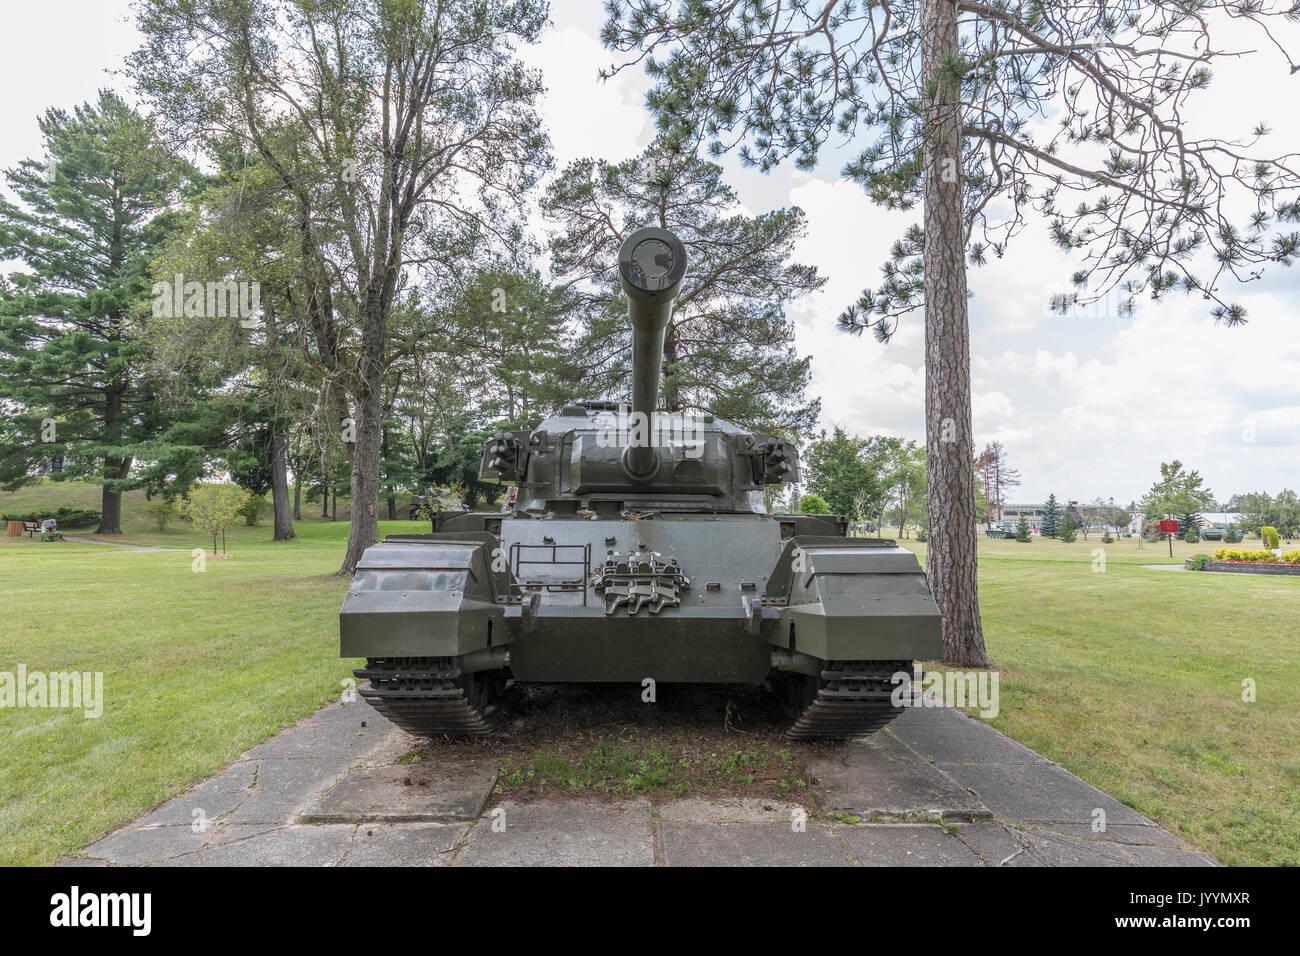 British Centurion MK5 Main Battle Tank - Stock Image